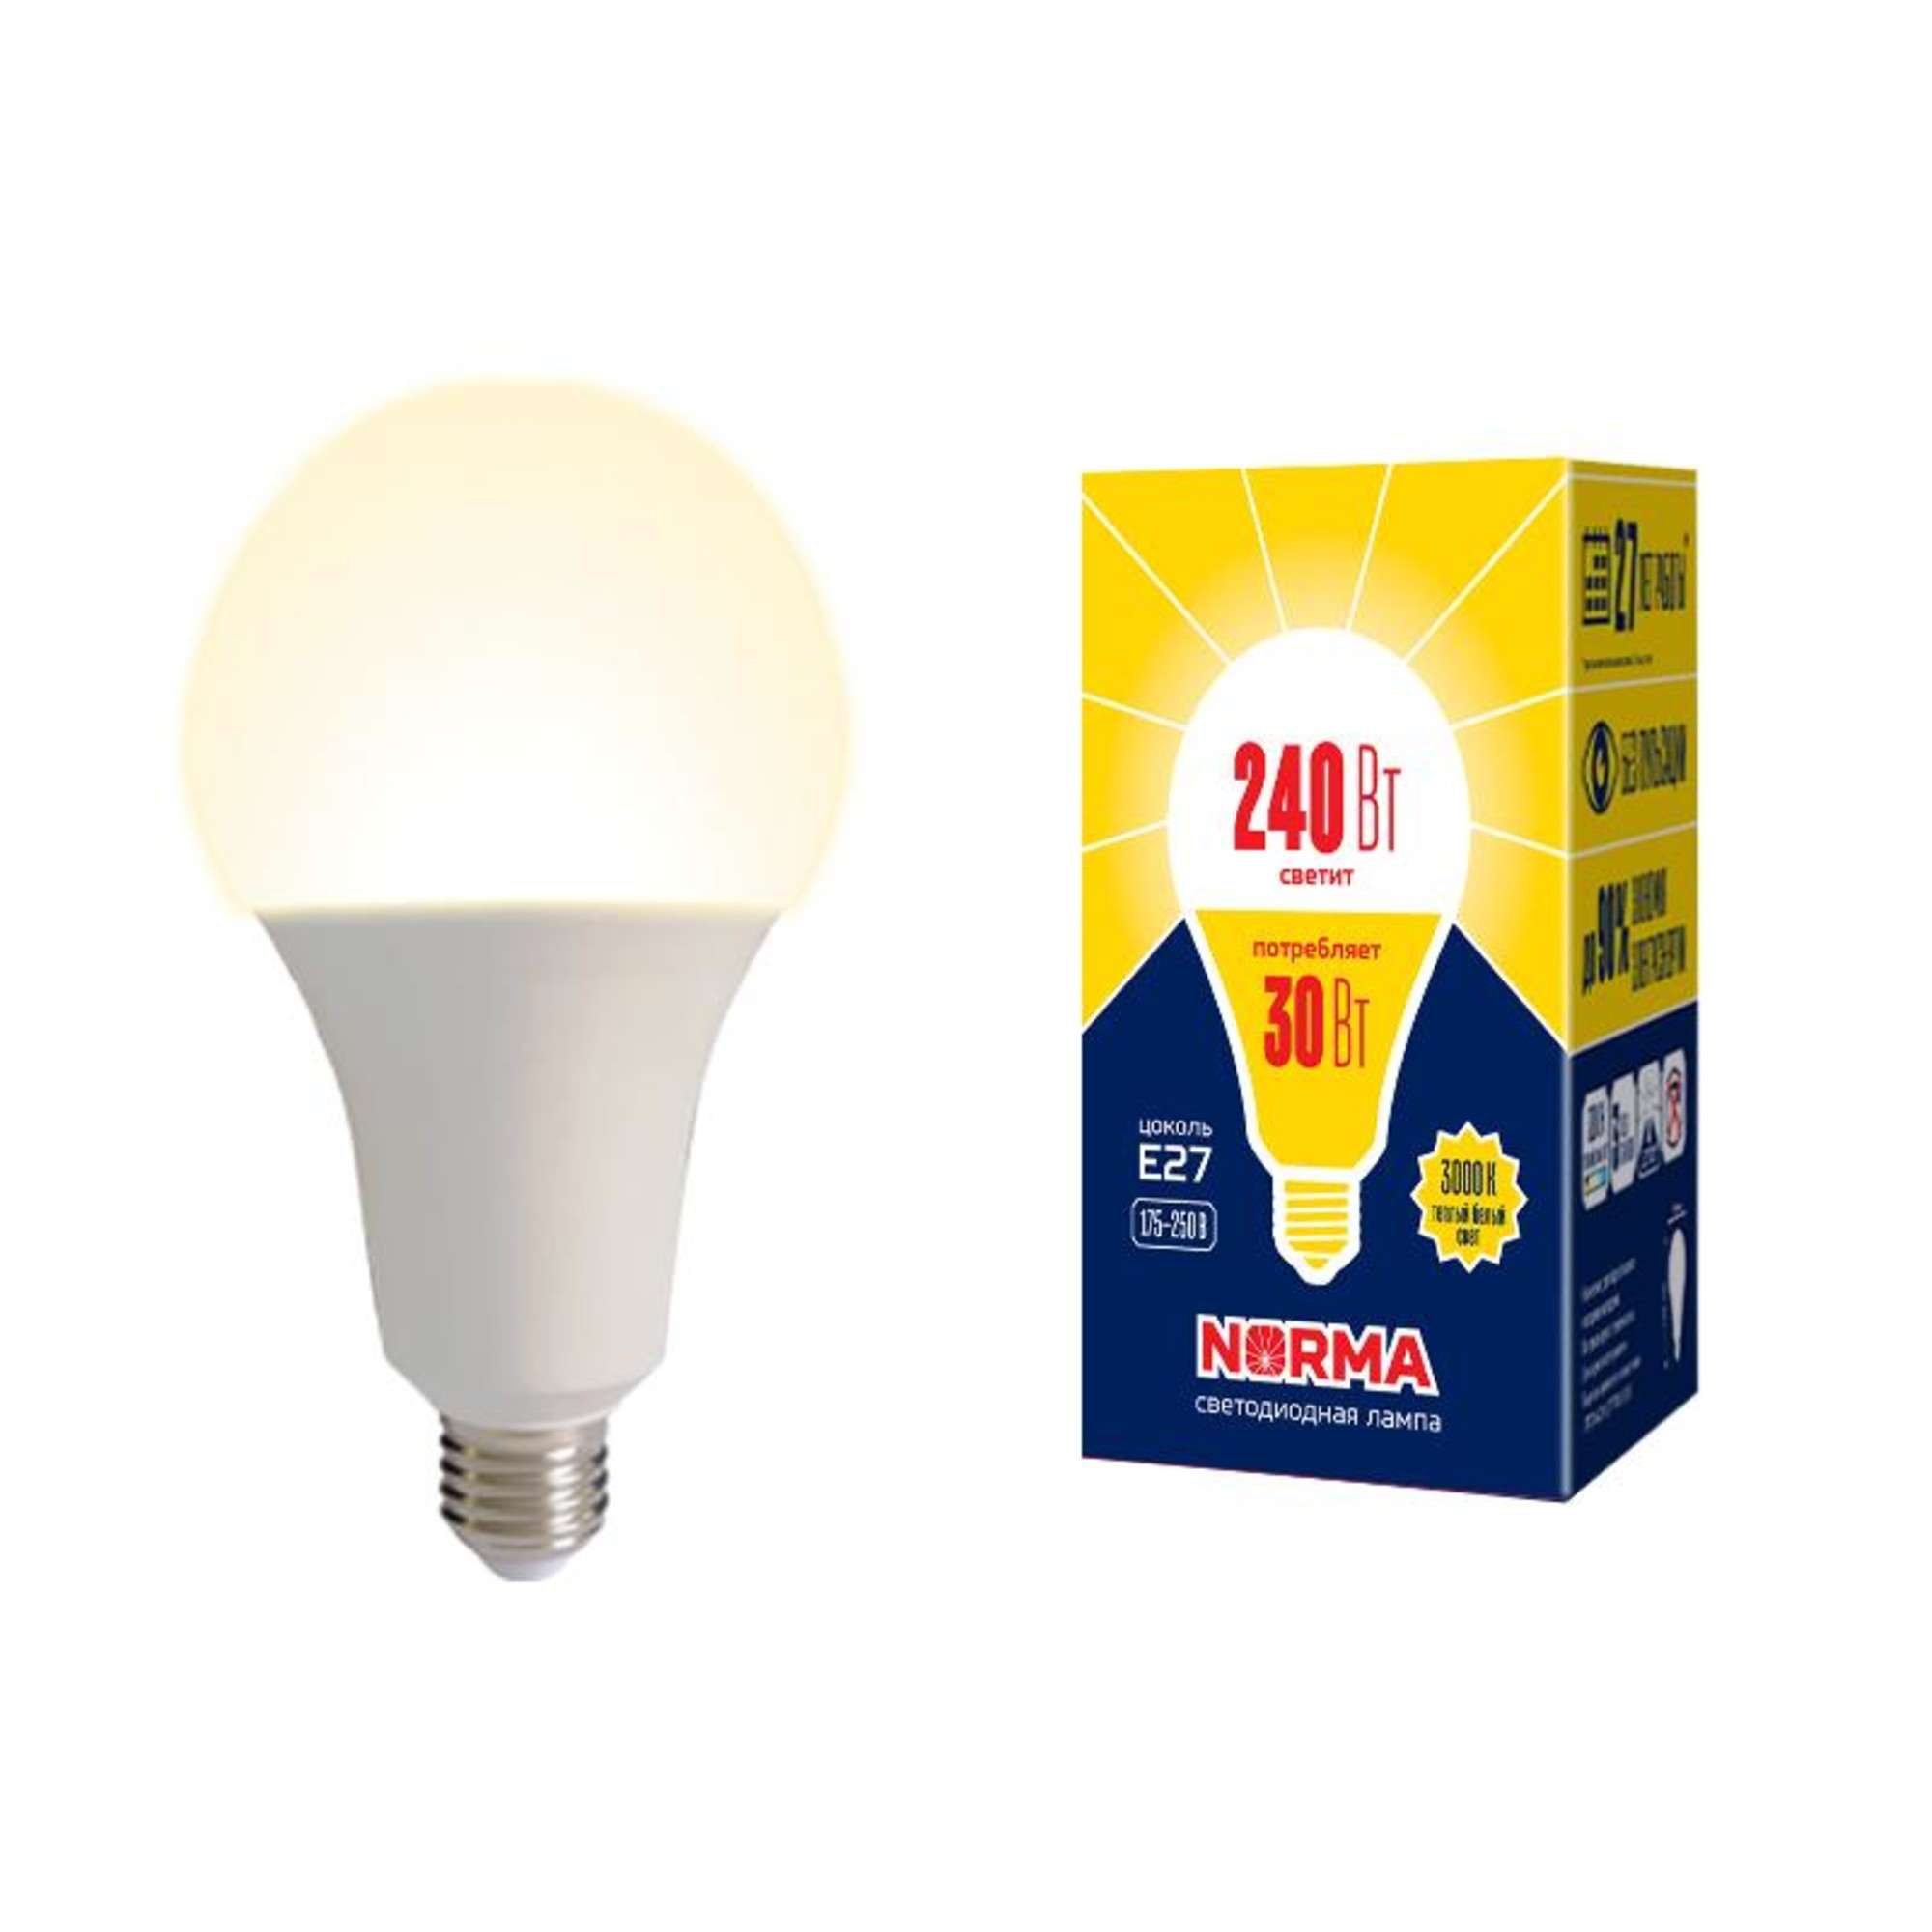 Лампа Volpe светодиодная E27 30 Вт теплый свет